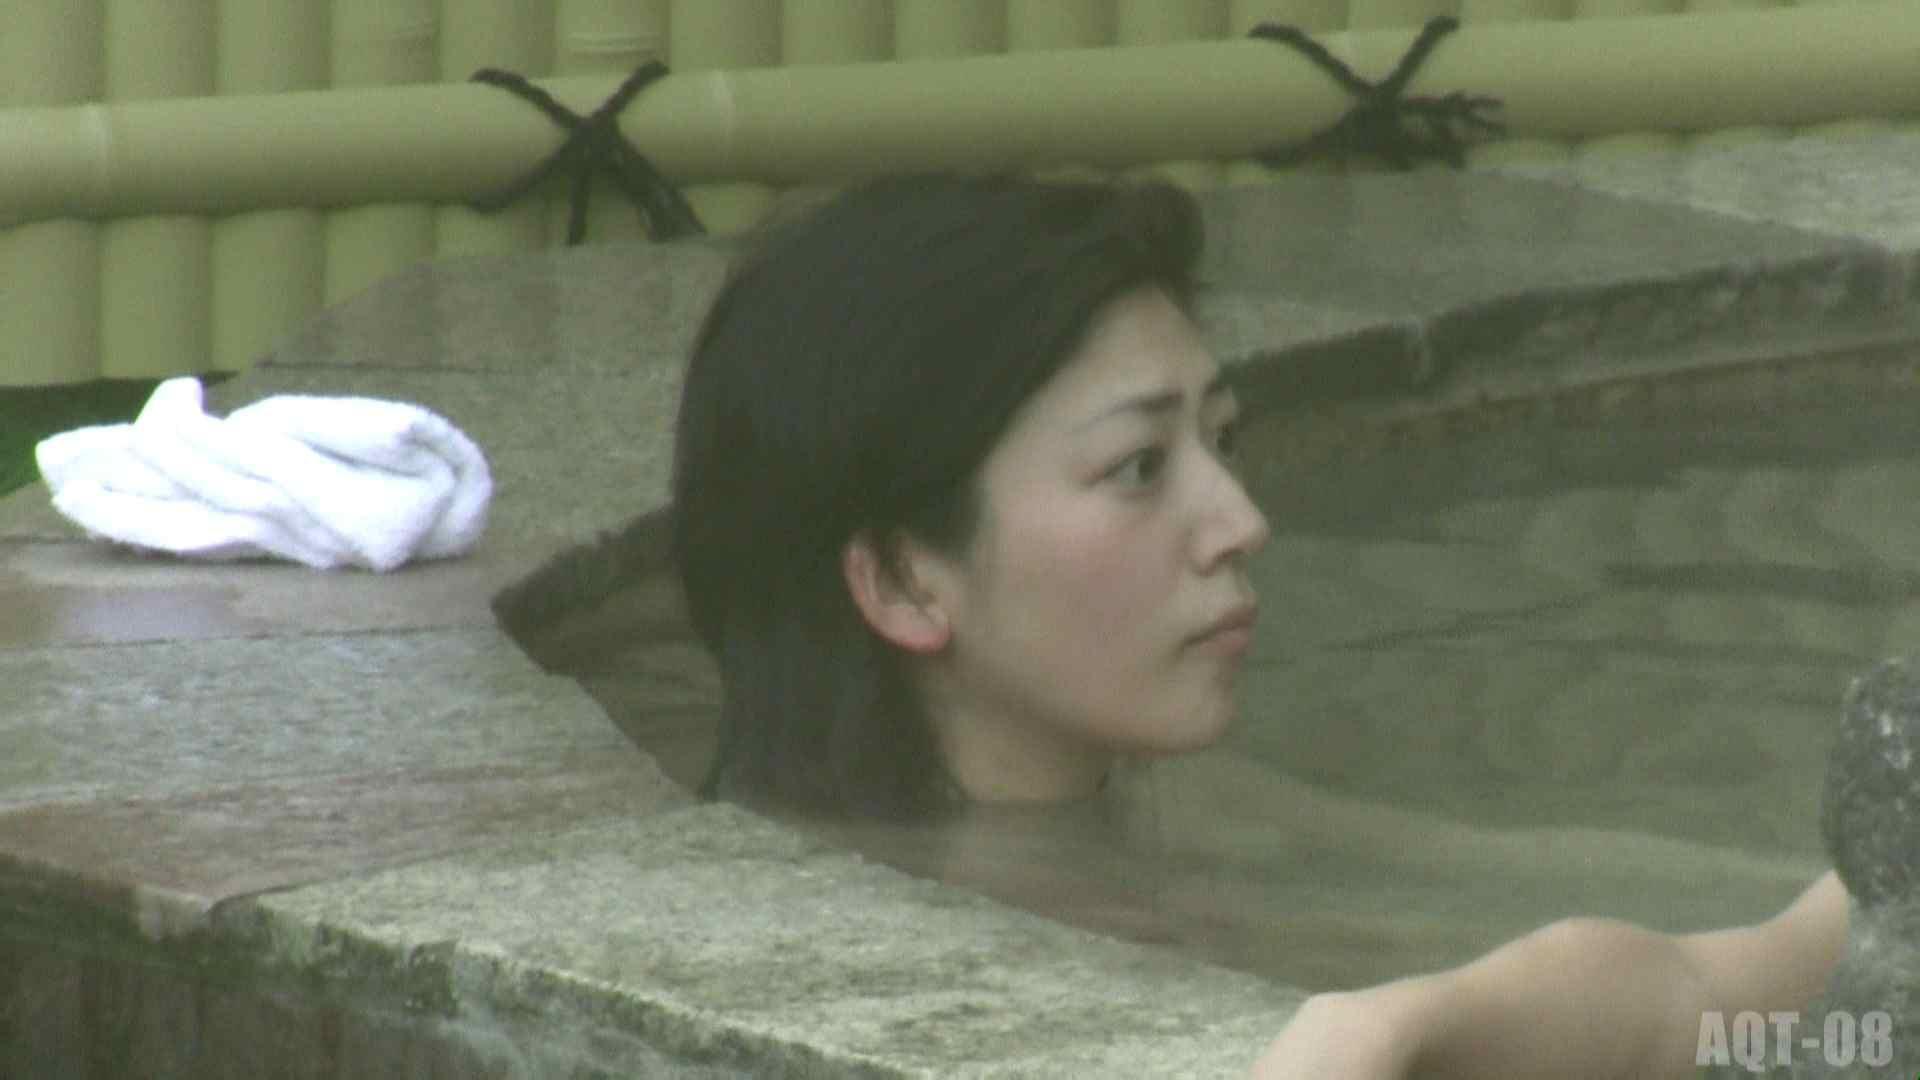 Aquaな露天風呂Vol.776 露天 | OLセックス  108画像 16